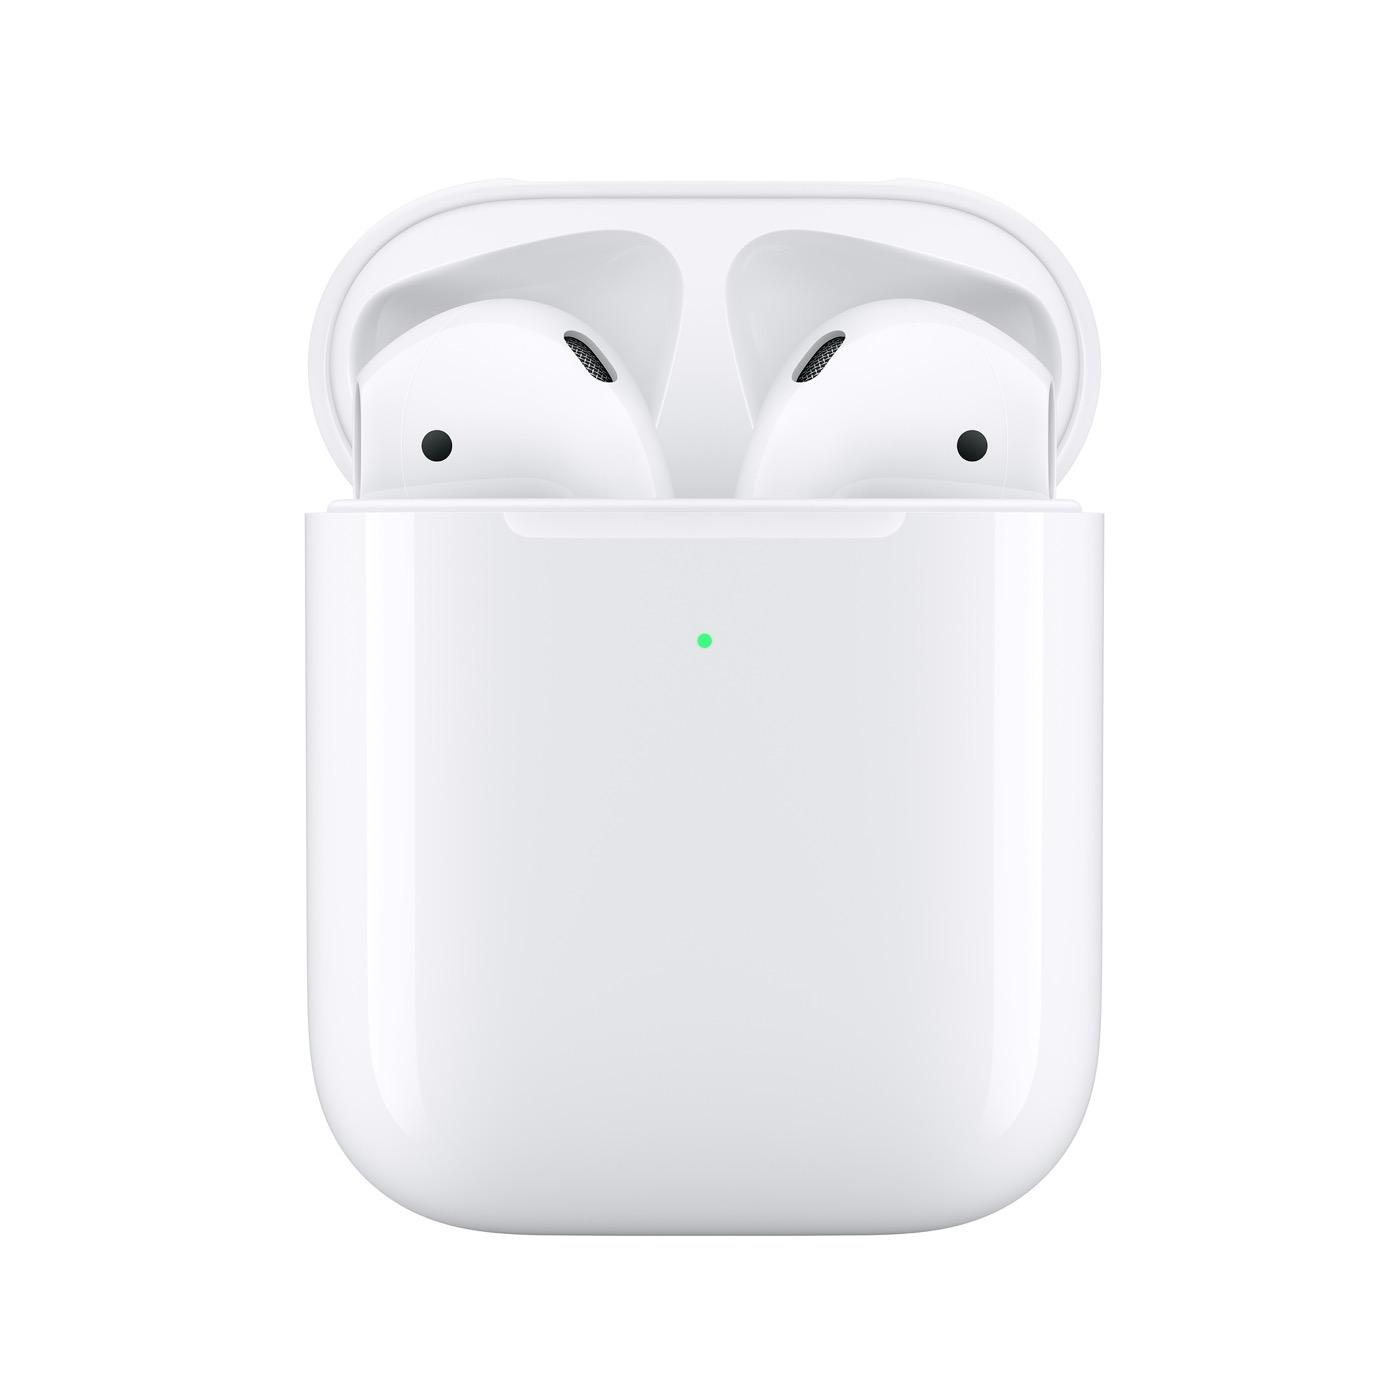 NTTドコモ、オンラインショップで一部Apple製品の取扱いを停止中 − 「Apple Watch」の新規予約受付も停止